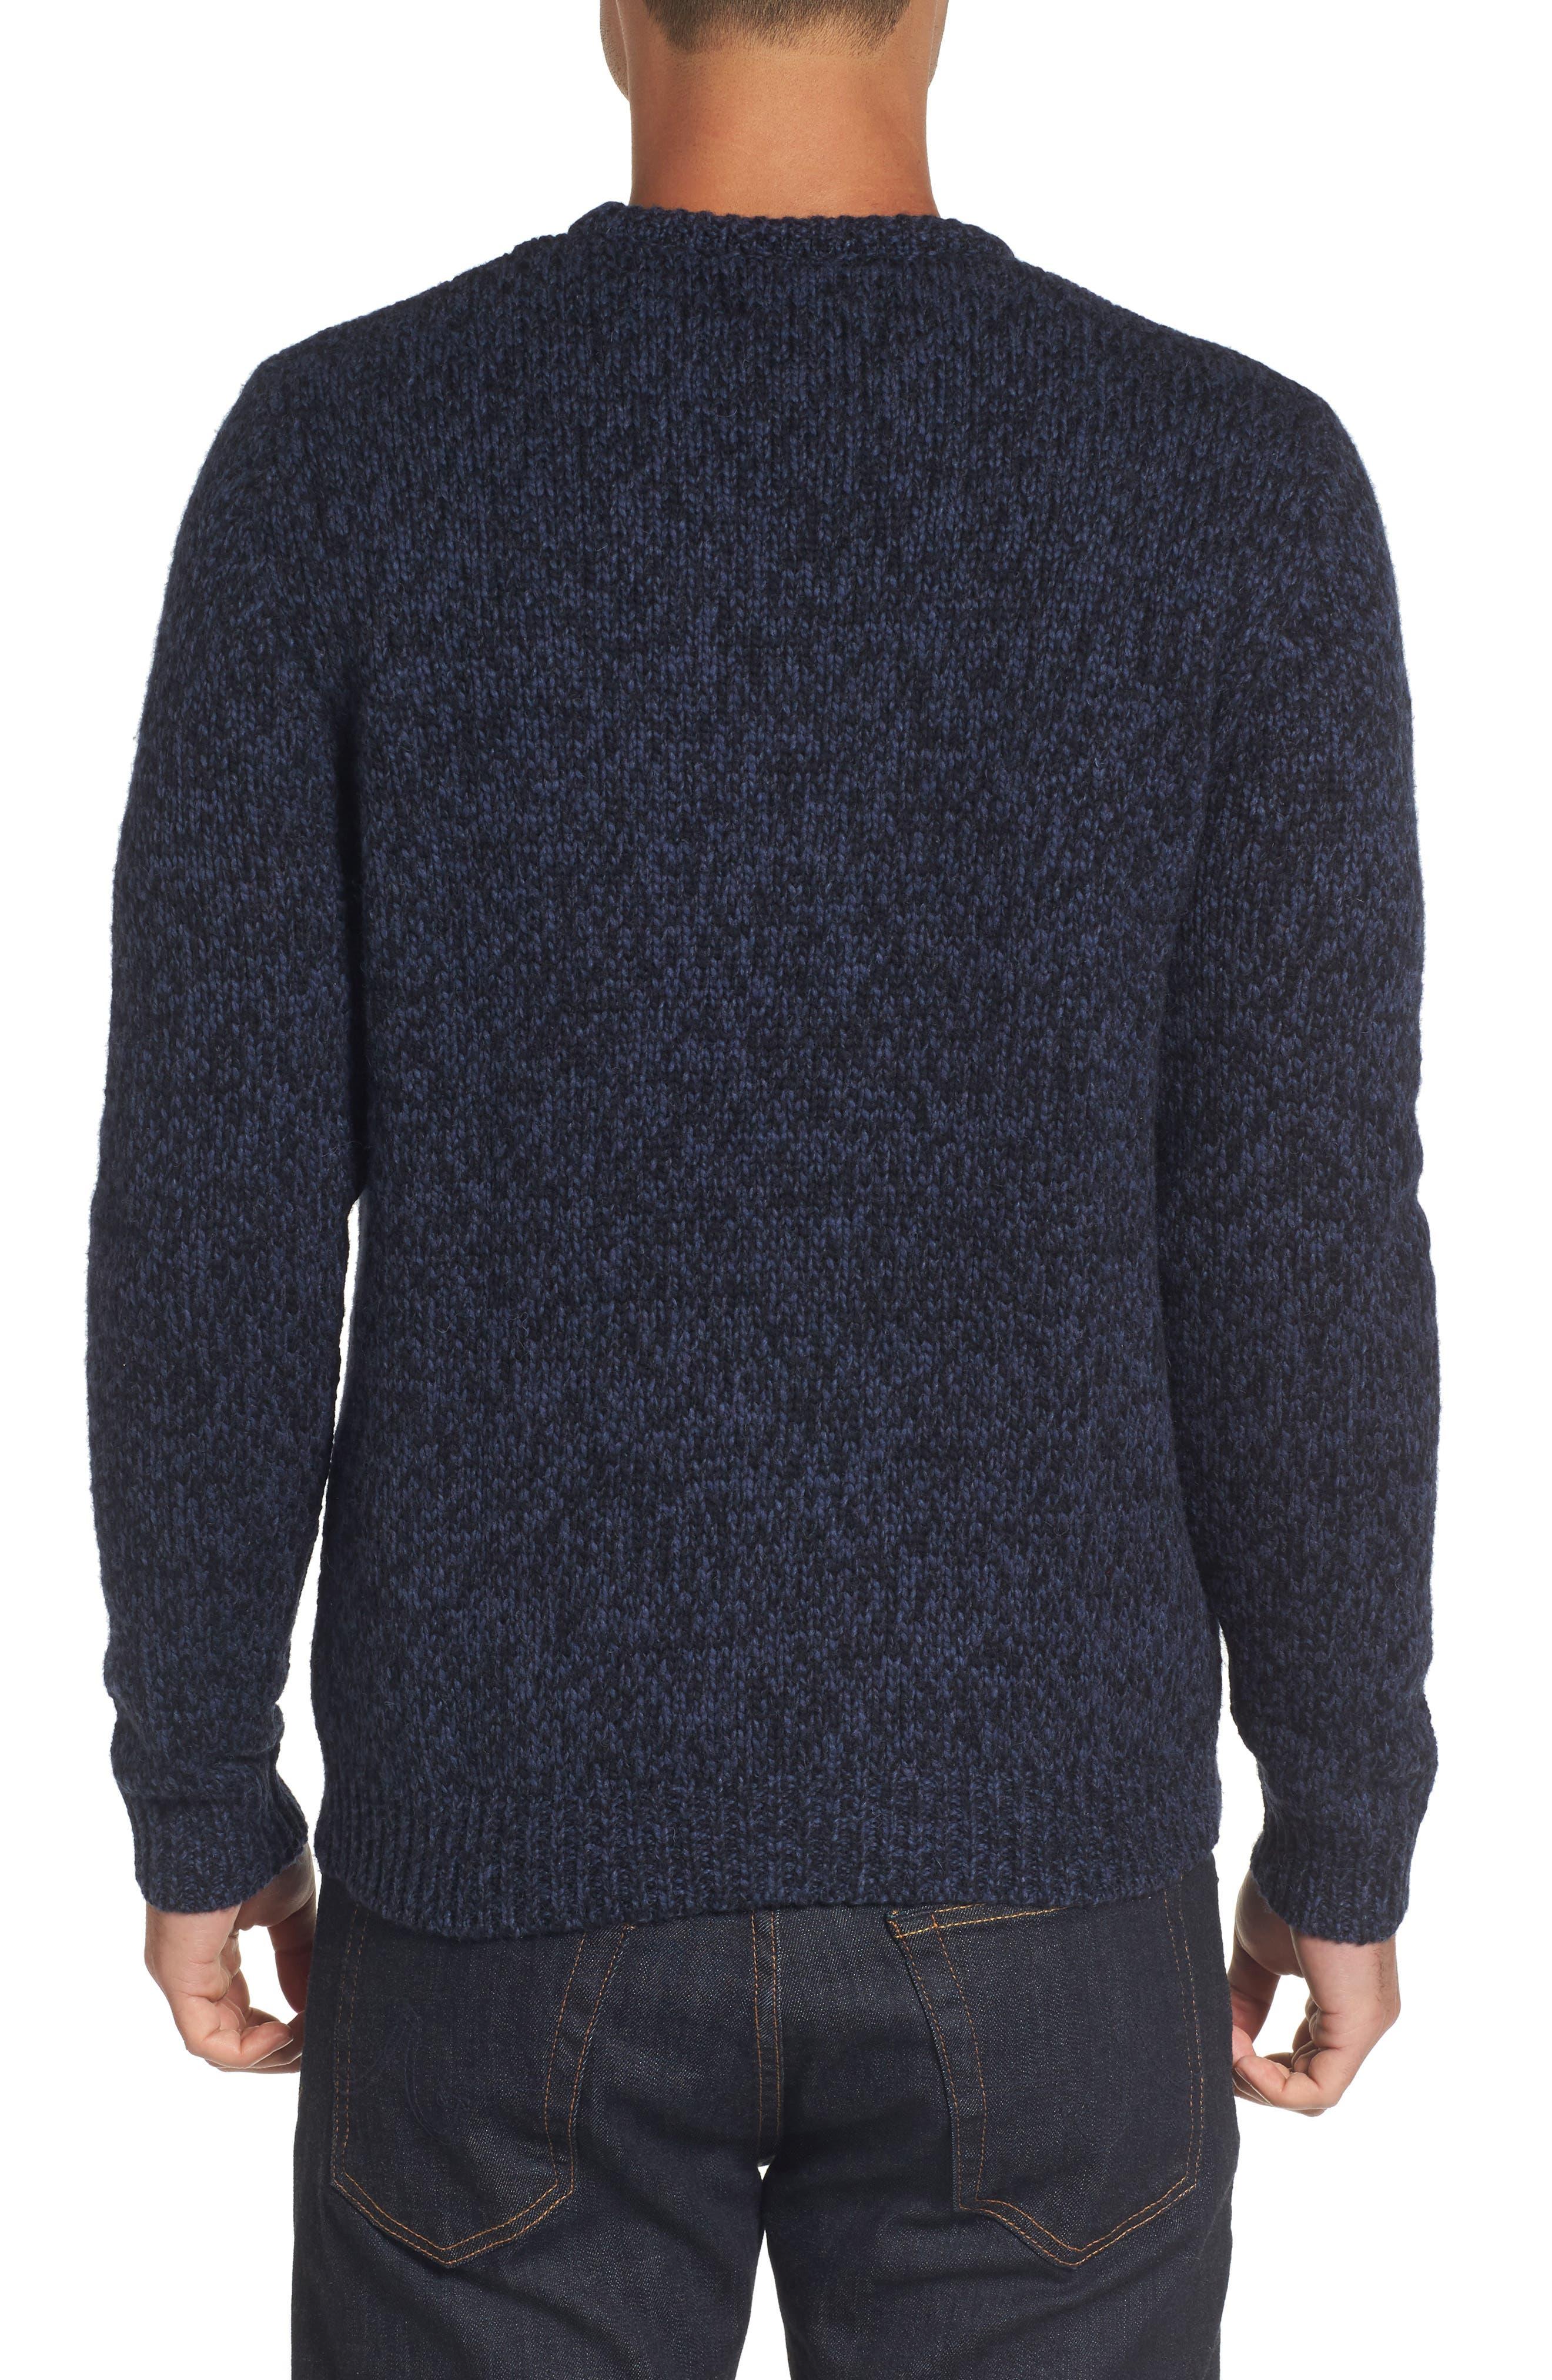 Marled Yarn Sweater,                             Alternate thumbnail 4, color,